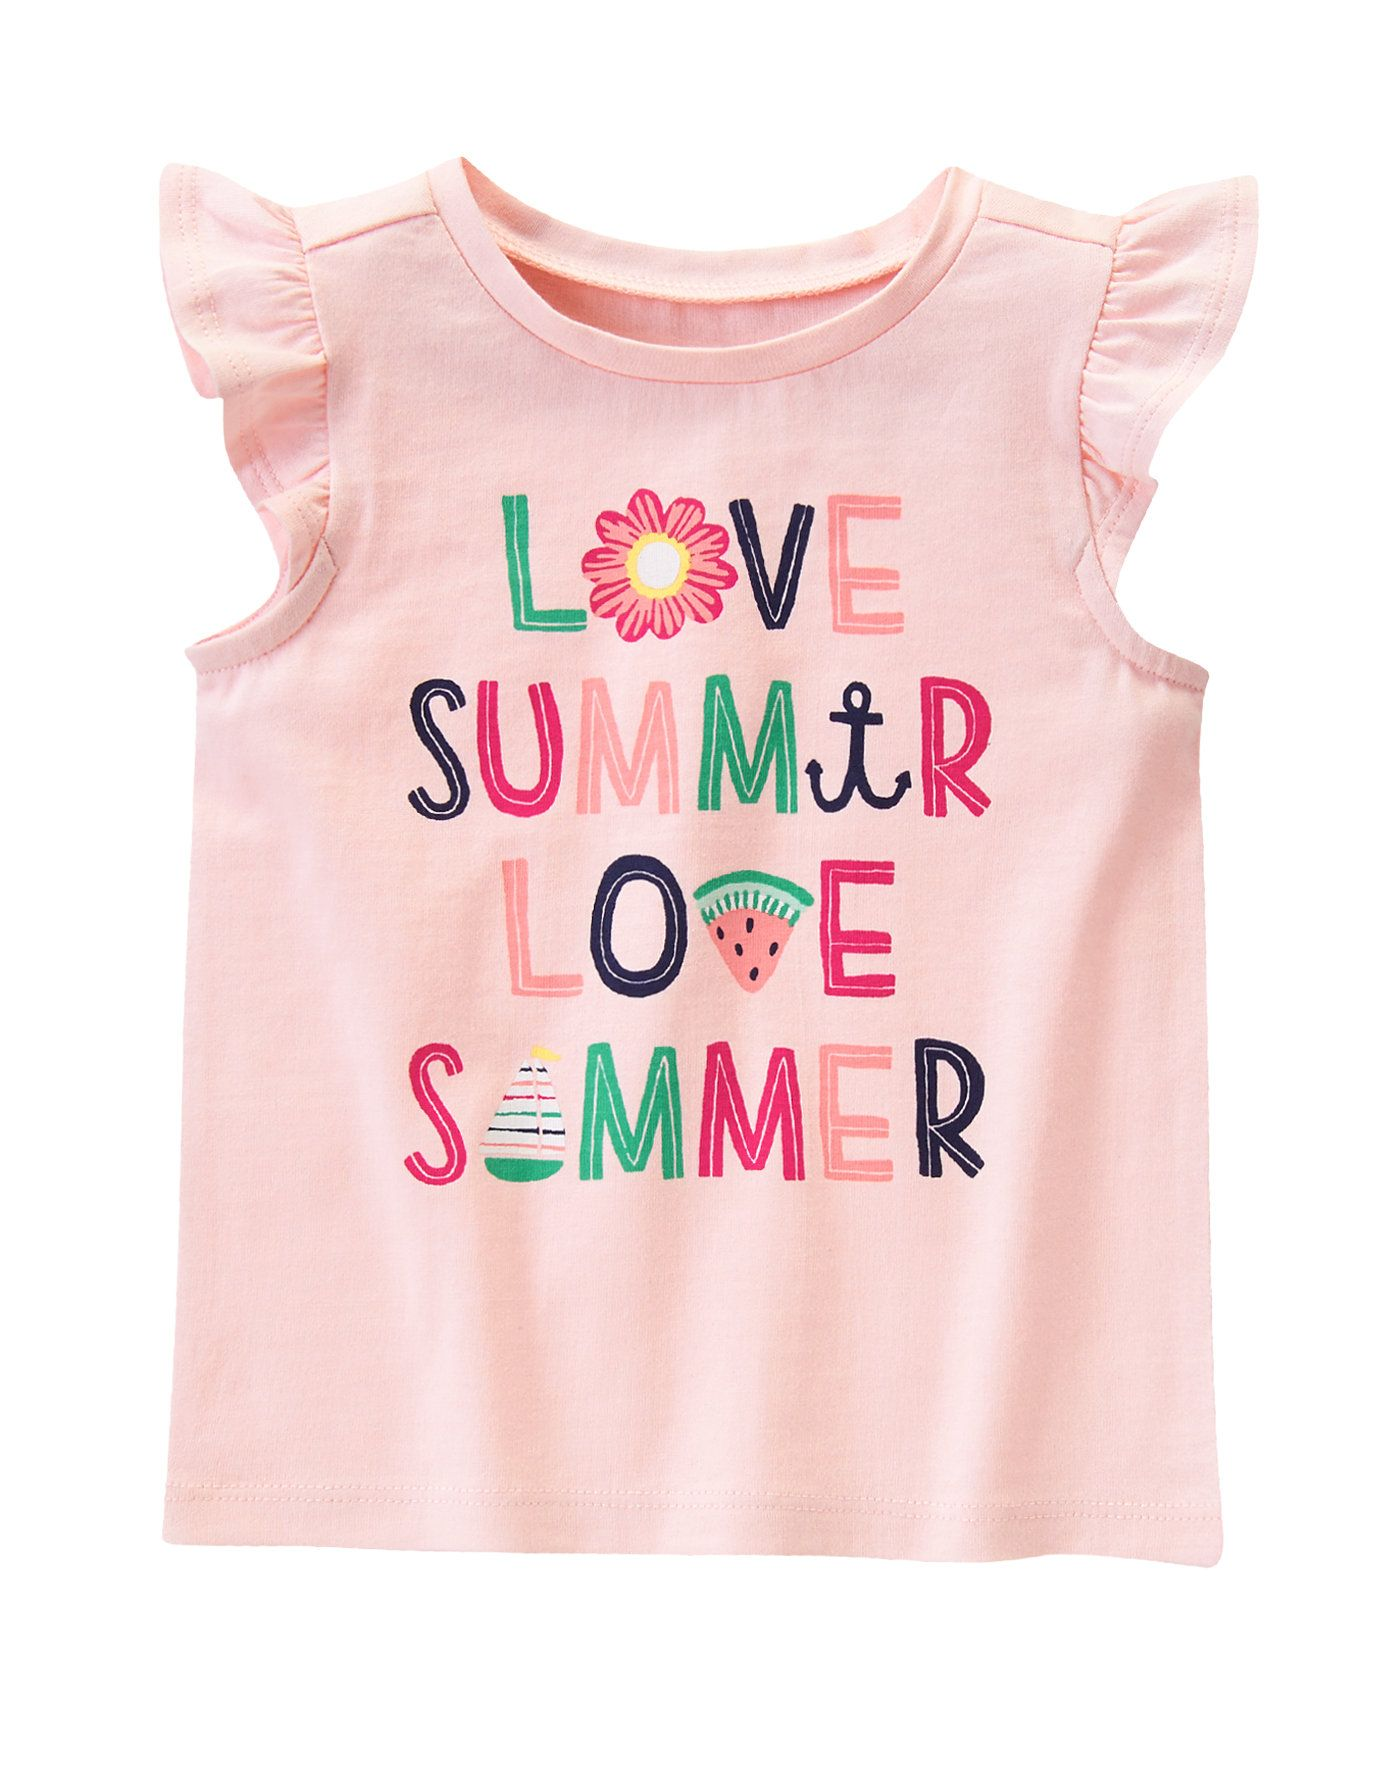 Love Summer Tee at Gymboree (Gymboree 6m-5T)